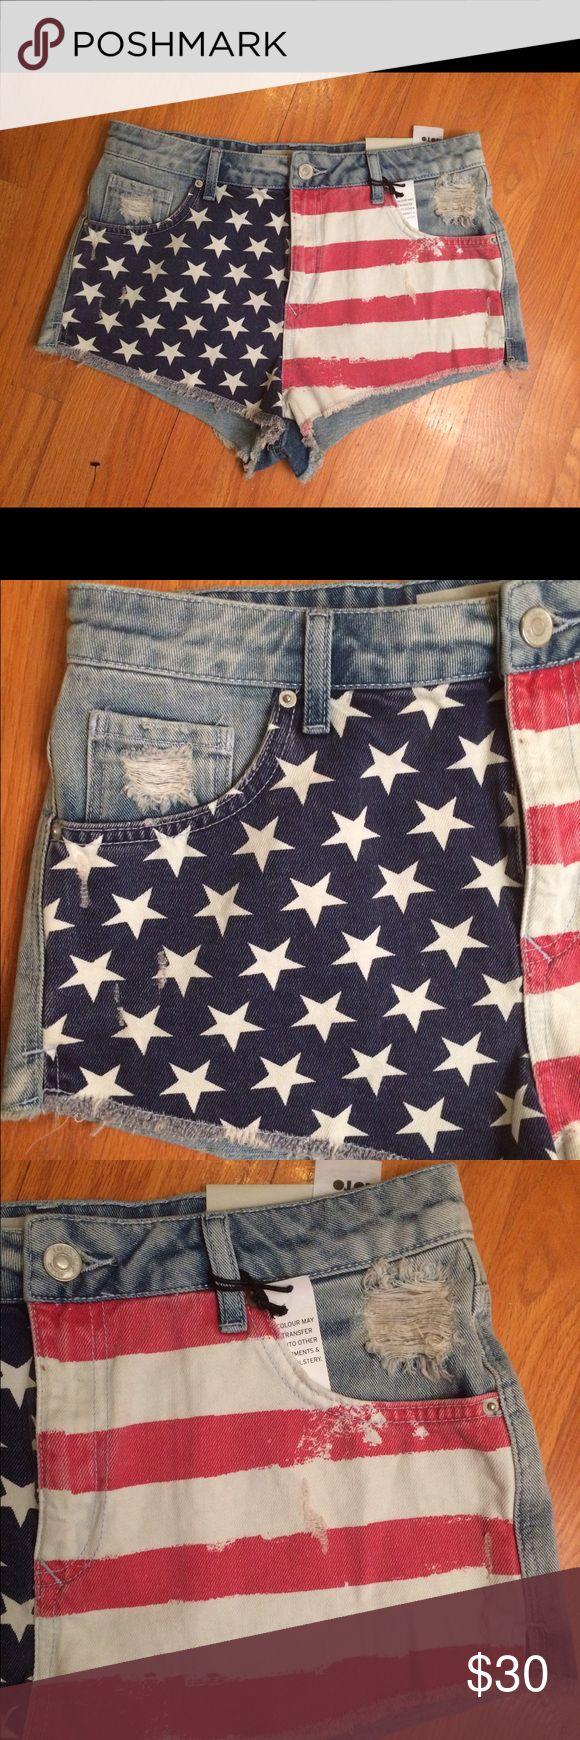 TopShop Moto High waisted Flag denim hot shorts TopShop Moto Brooke High waisted Flag denim hot pants shorts.  Sz 8 Topshop Shorts Jean Shorts